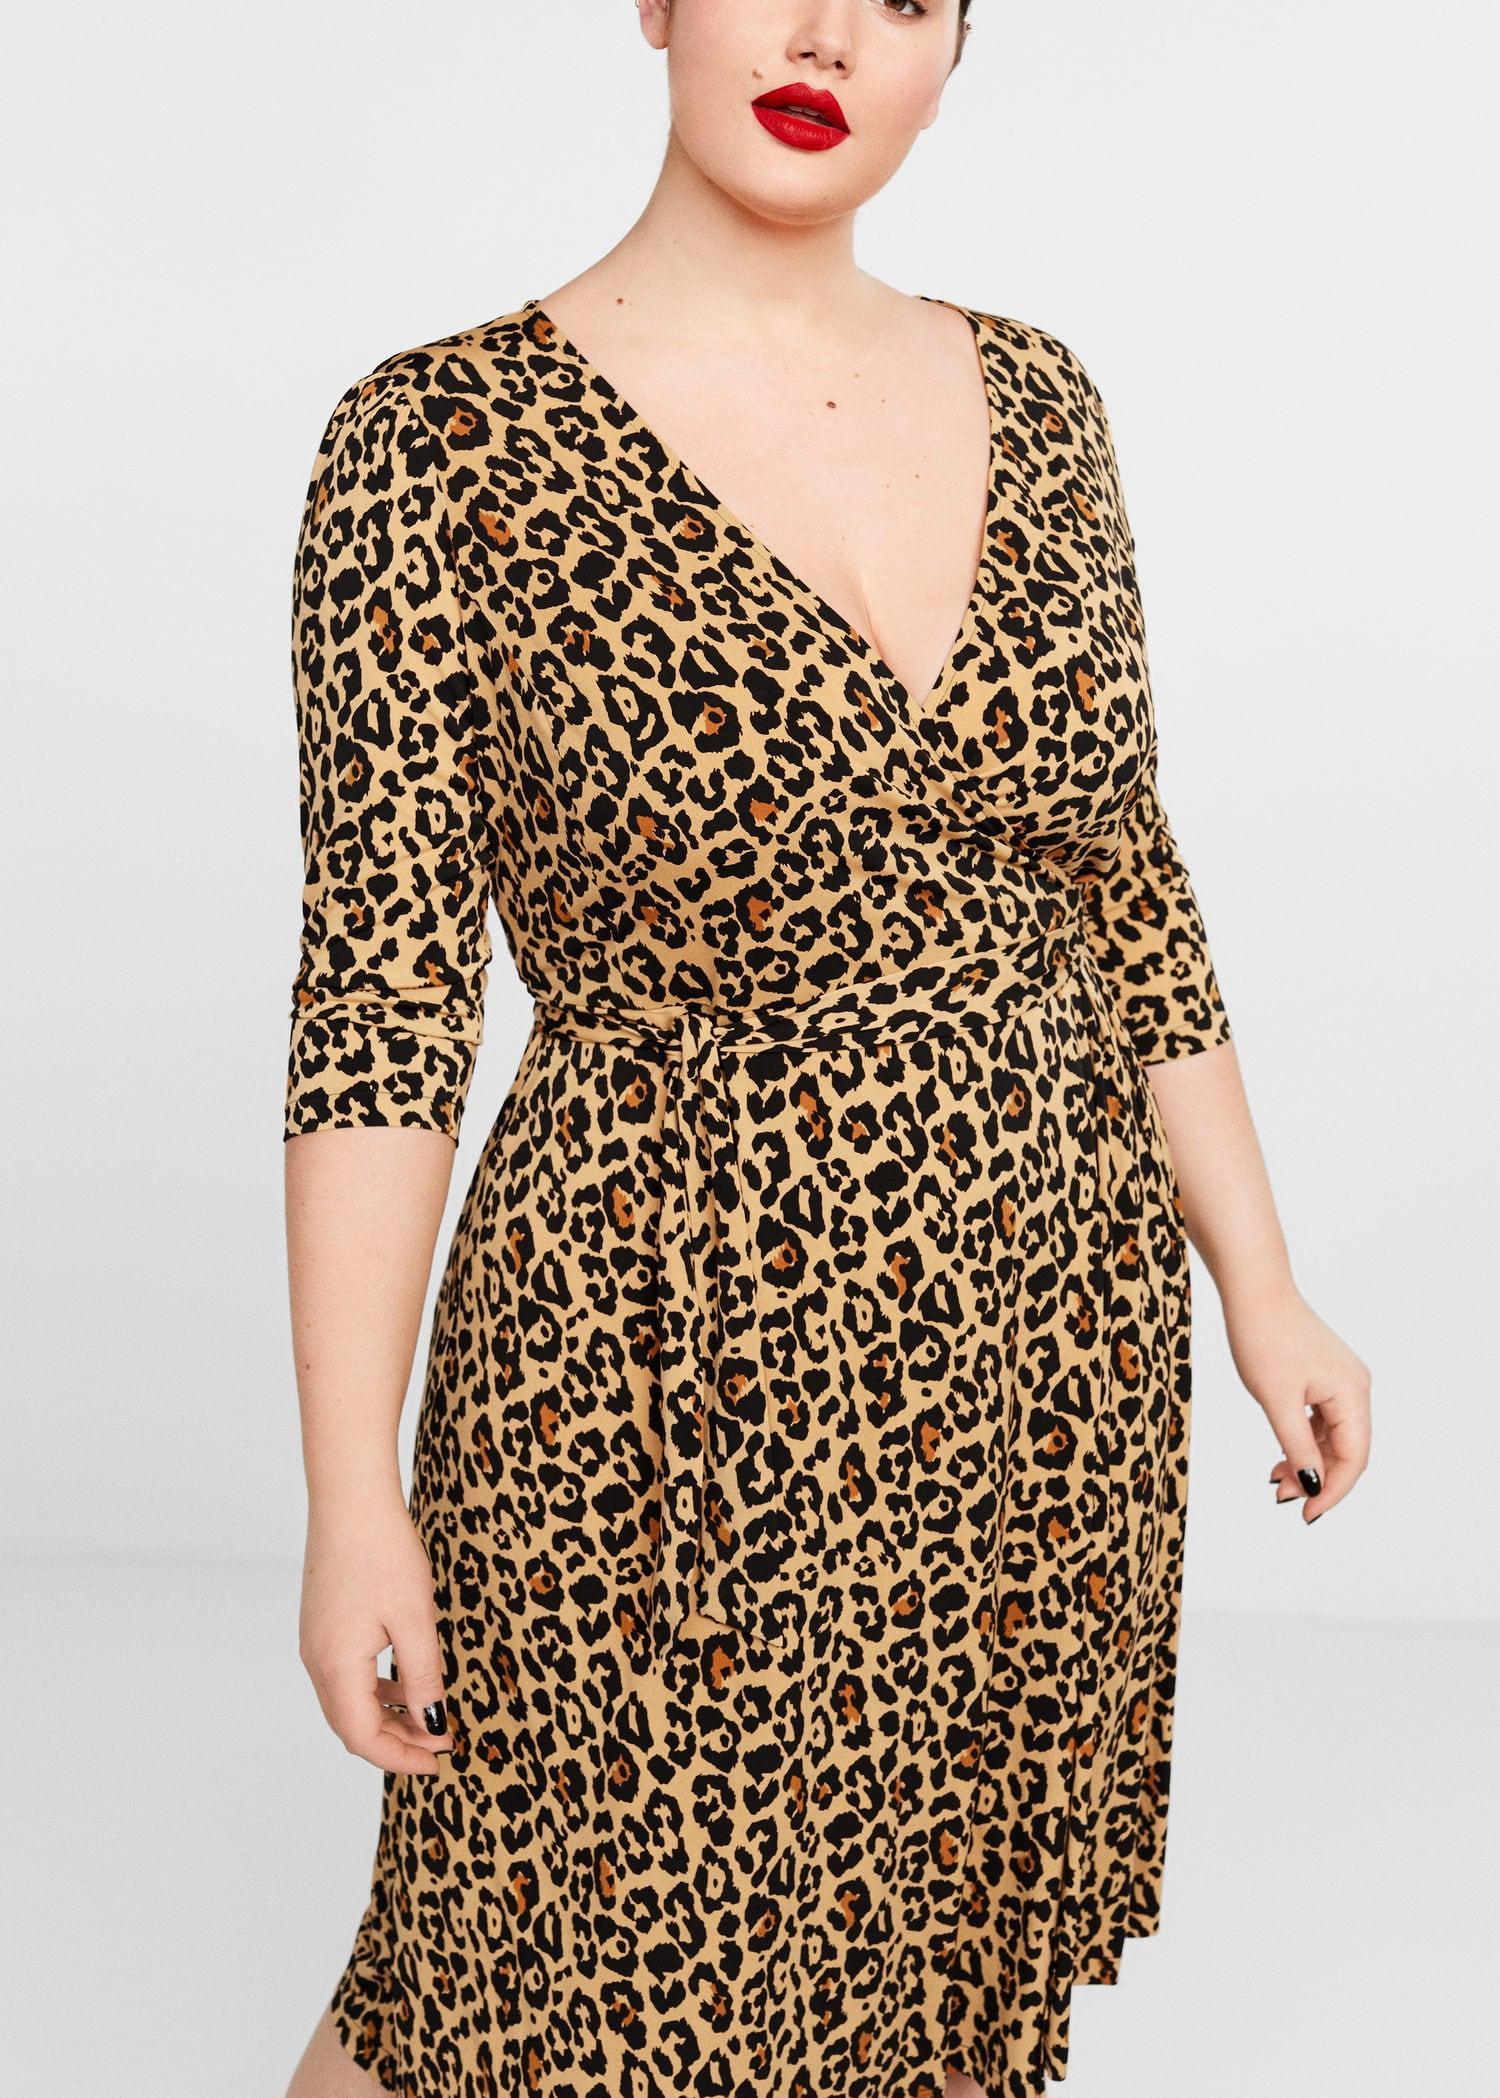 cef958f9d80e01 Violeta by Mango Leopard Print Wrap Dress in Brown - Lyst